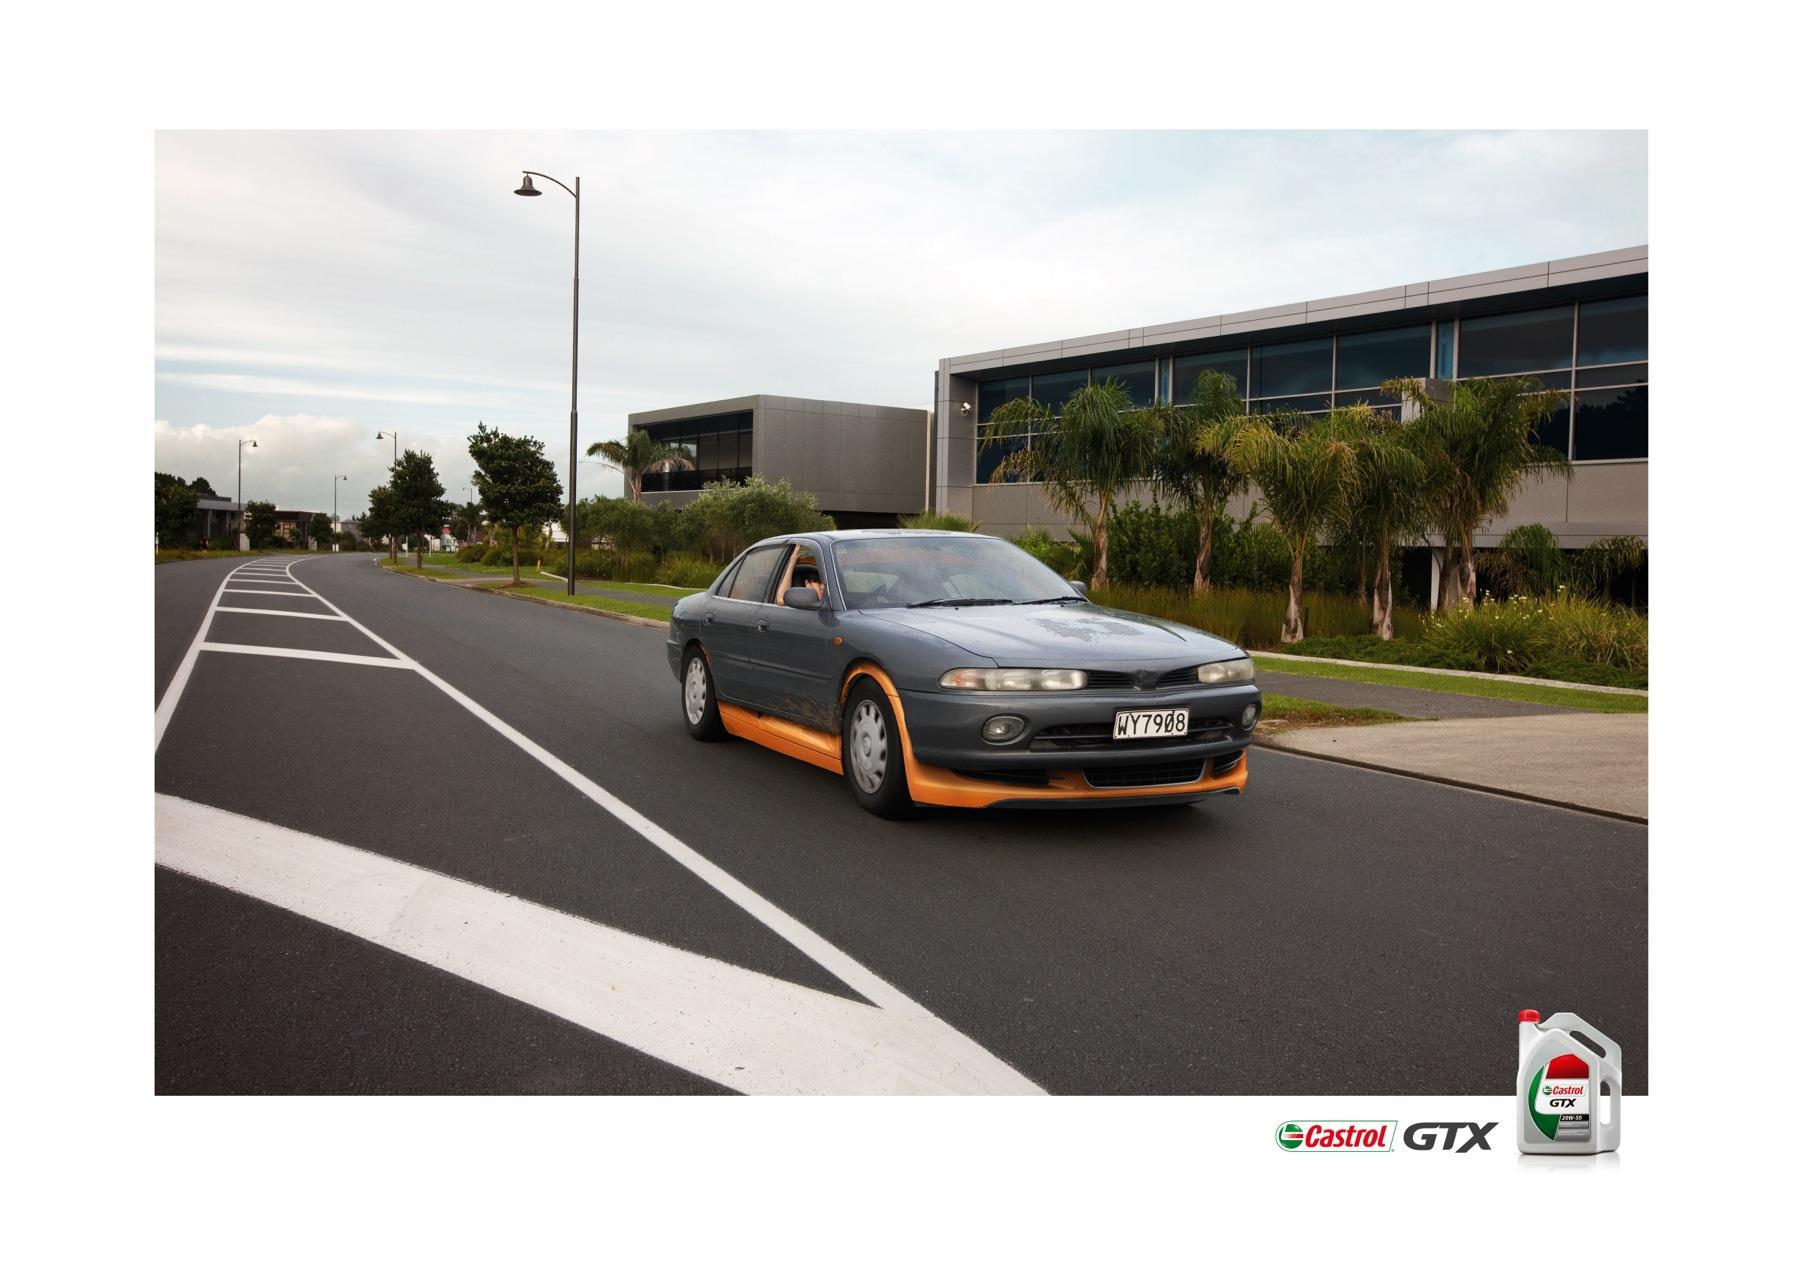 Castrol Print Ad -  Audi